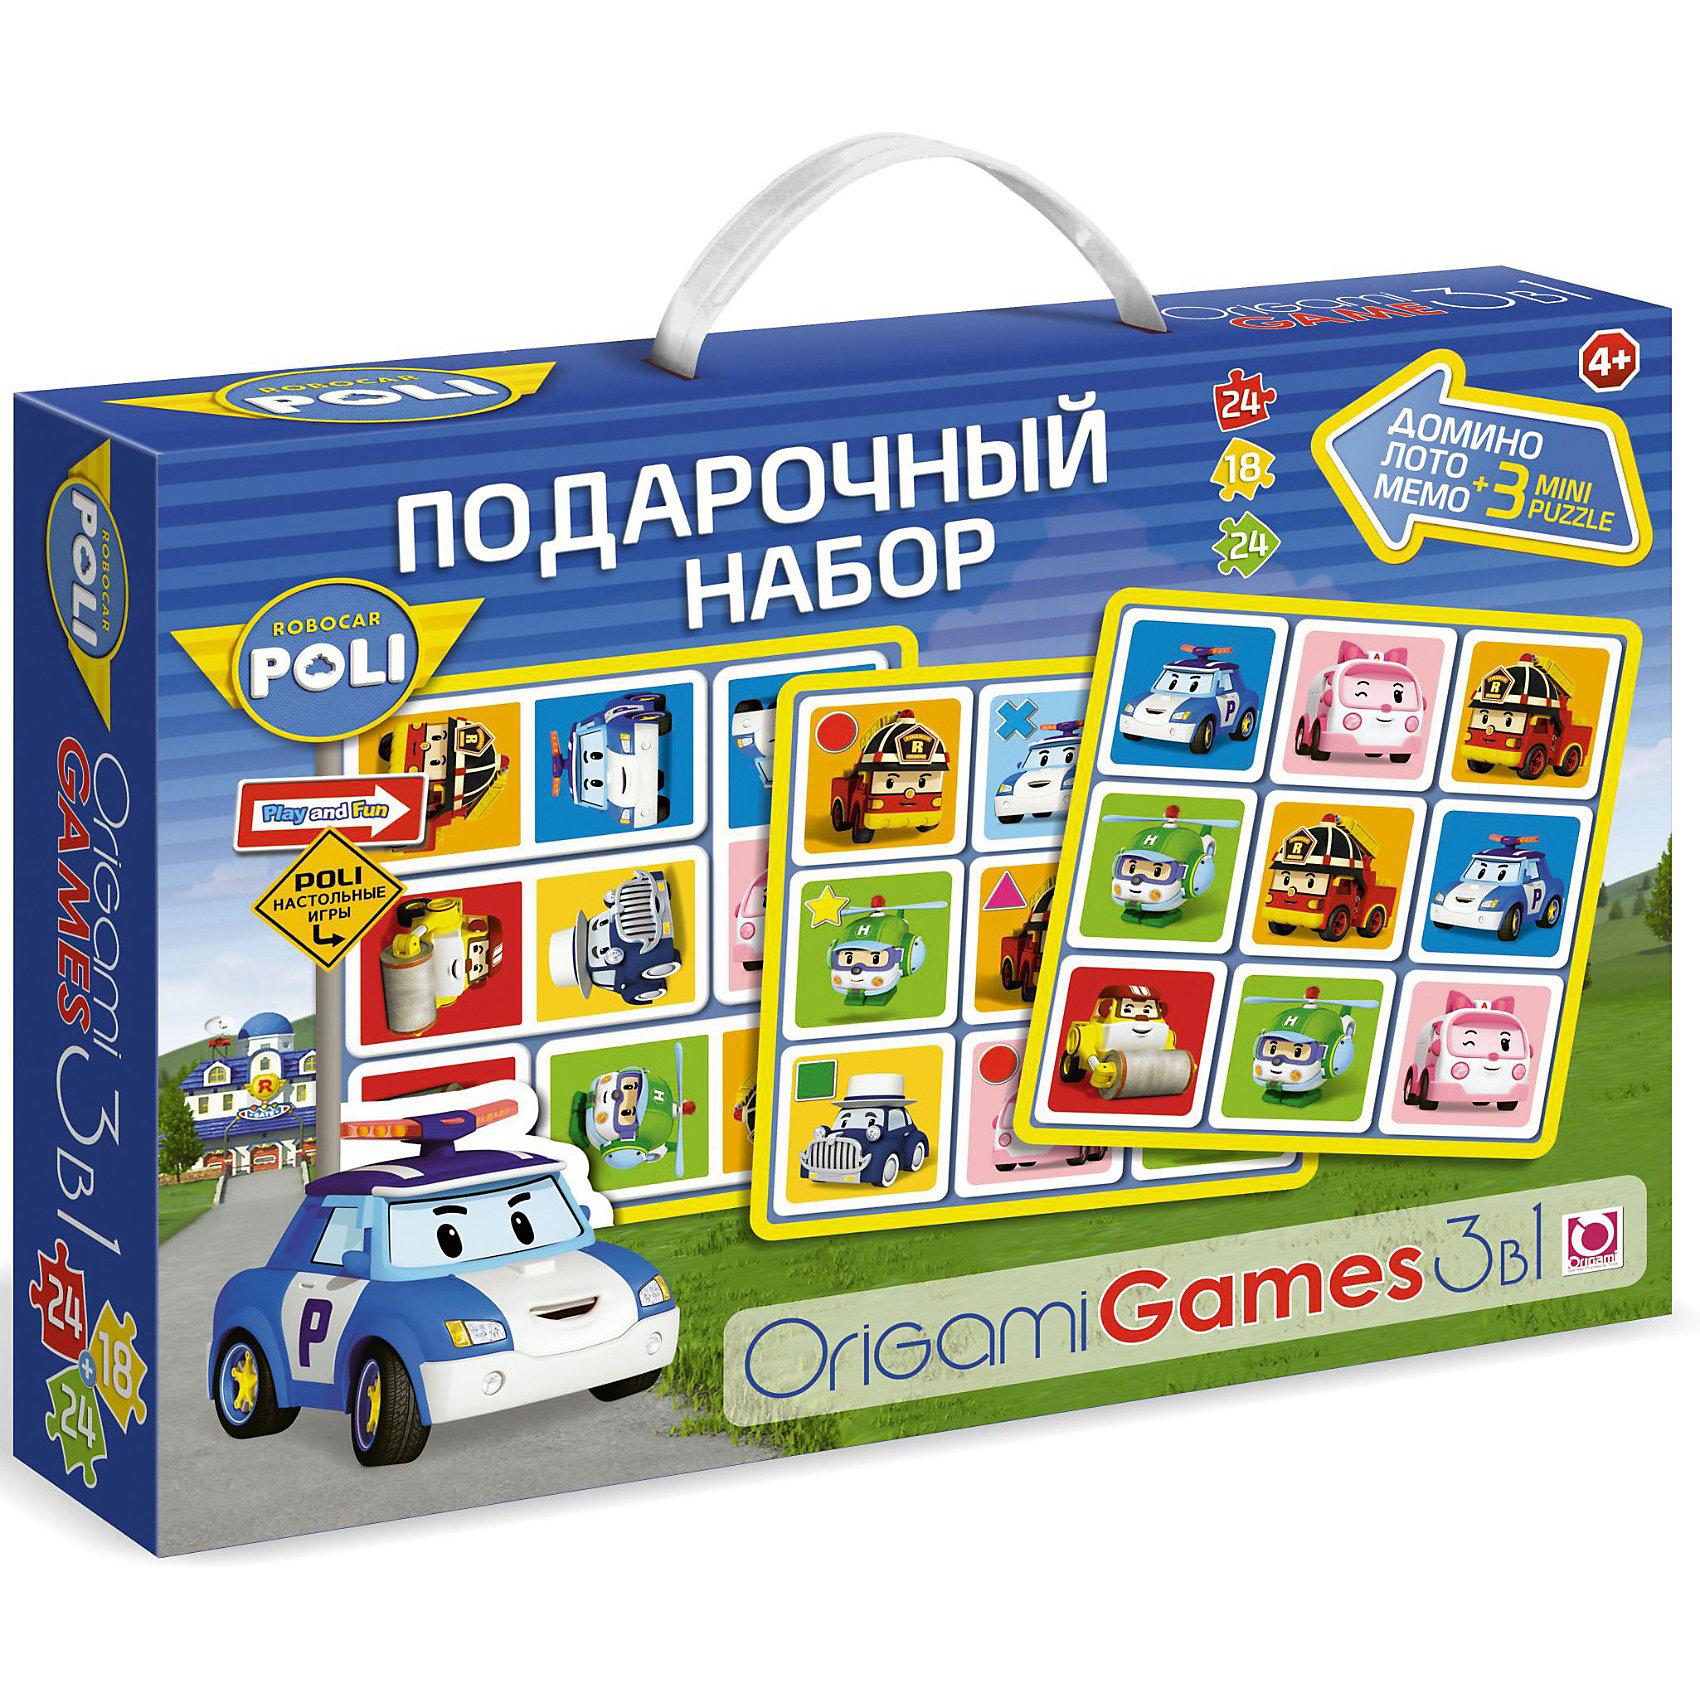 Origami Игра 3 в 1 Лото, домино, мемо + Набор пазлов 24*18*24 деталей, Робокар Поли origami игра 3 в 1 лото домино мемо набор пазлов 24 18 24 деталей фиксики